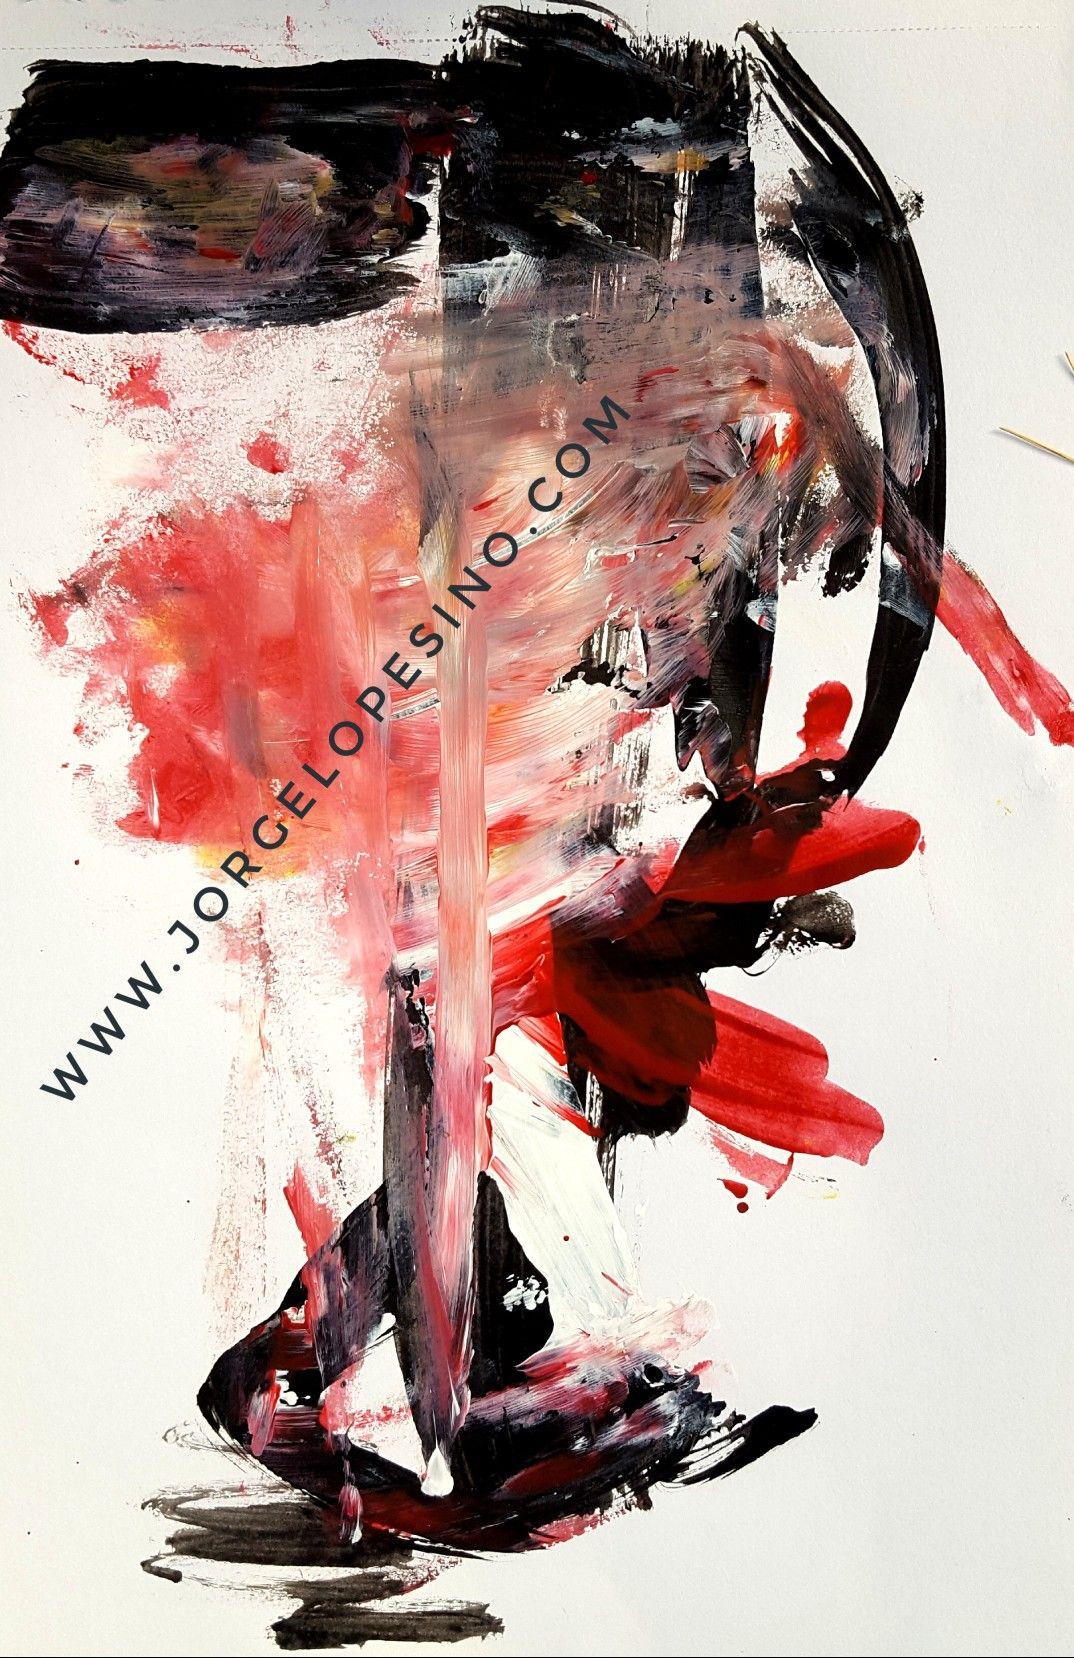 Abstract art art abstract artwork